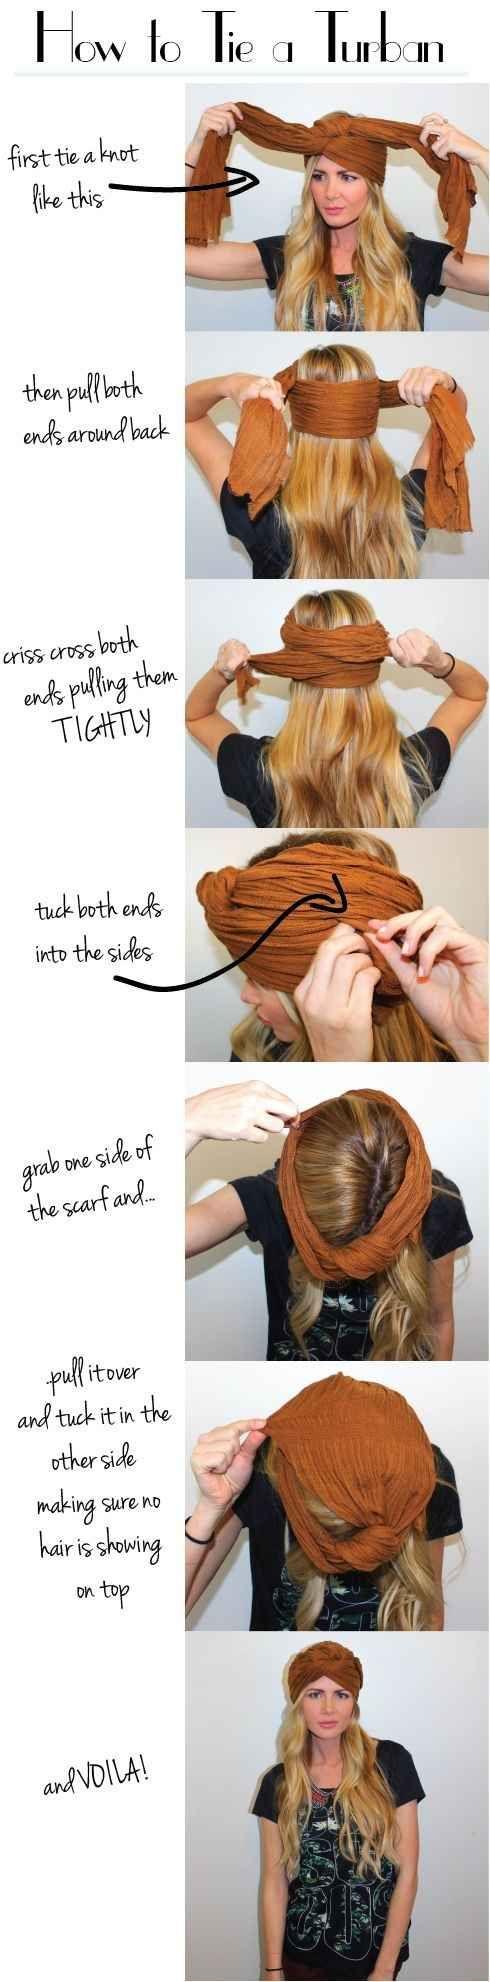 "Cubre un ""mal día para el cabello"" con un turbante. | 26 peinados rápidos para chicas perezosas"